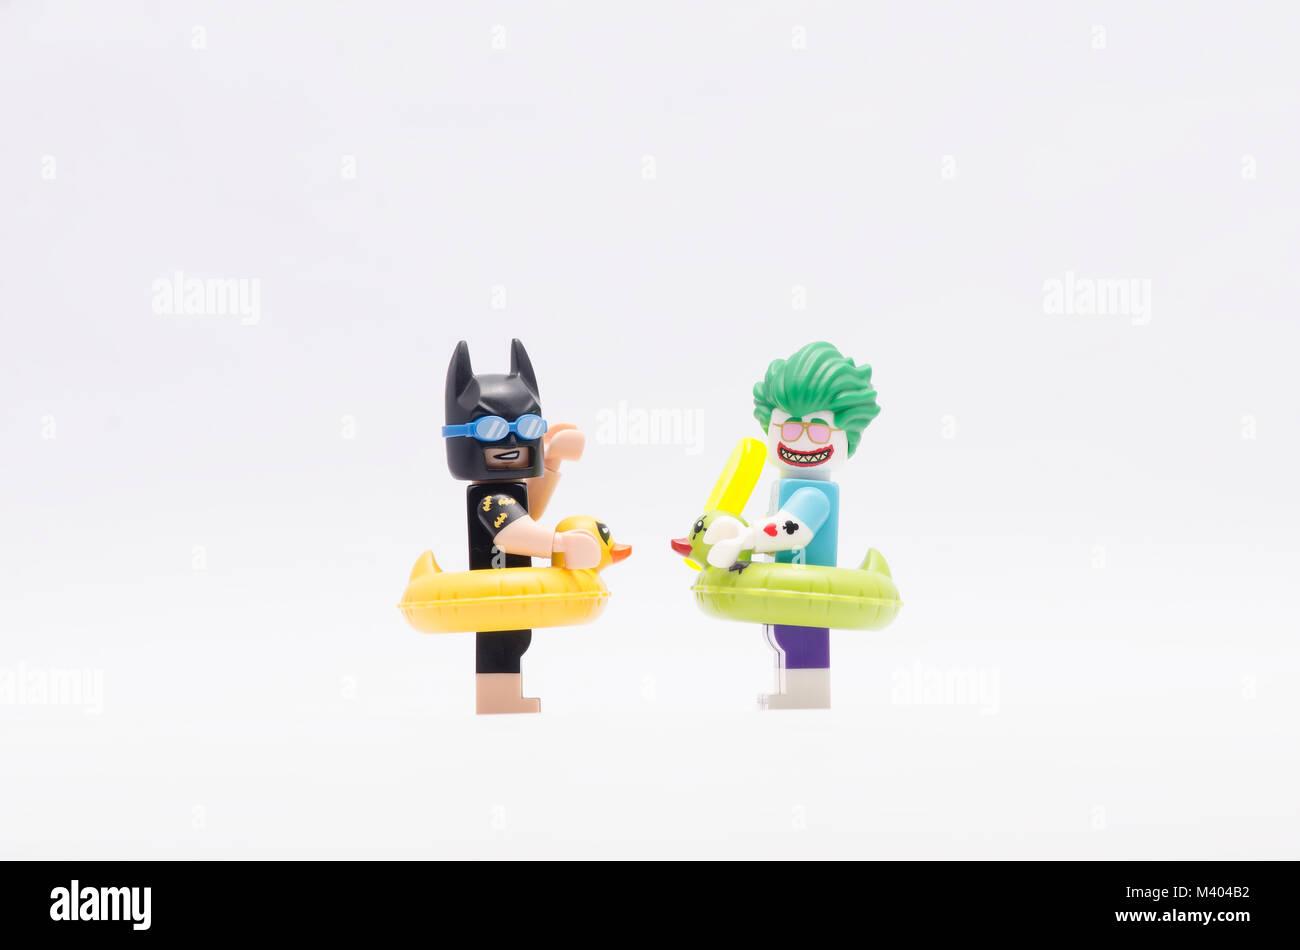 Lego Vacation Batman And Beach Joker Isolated On White Background